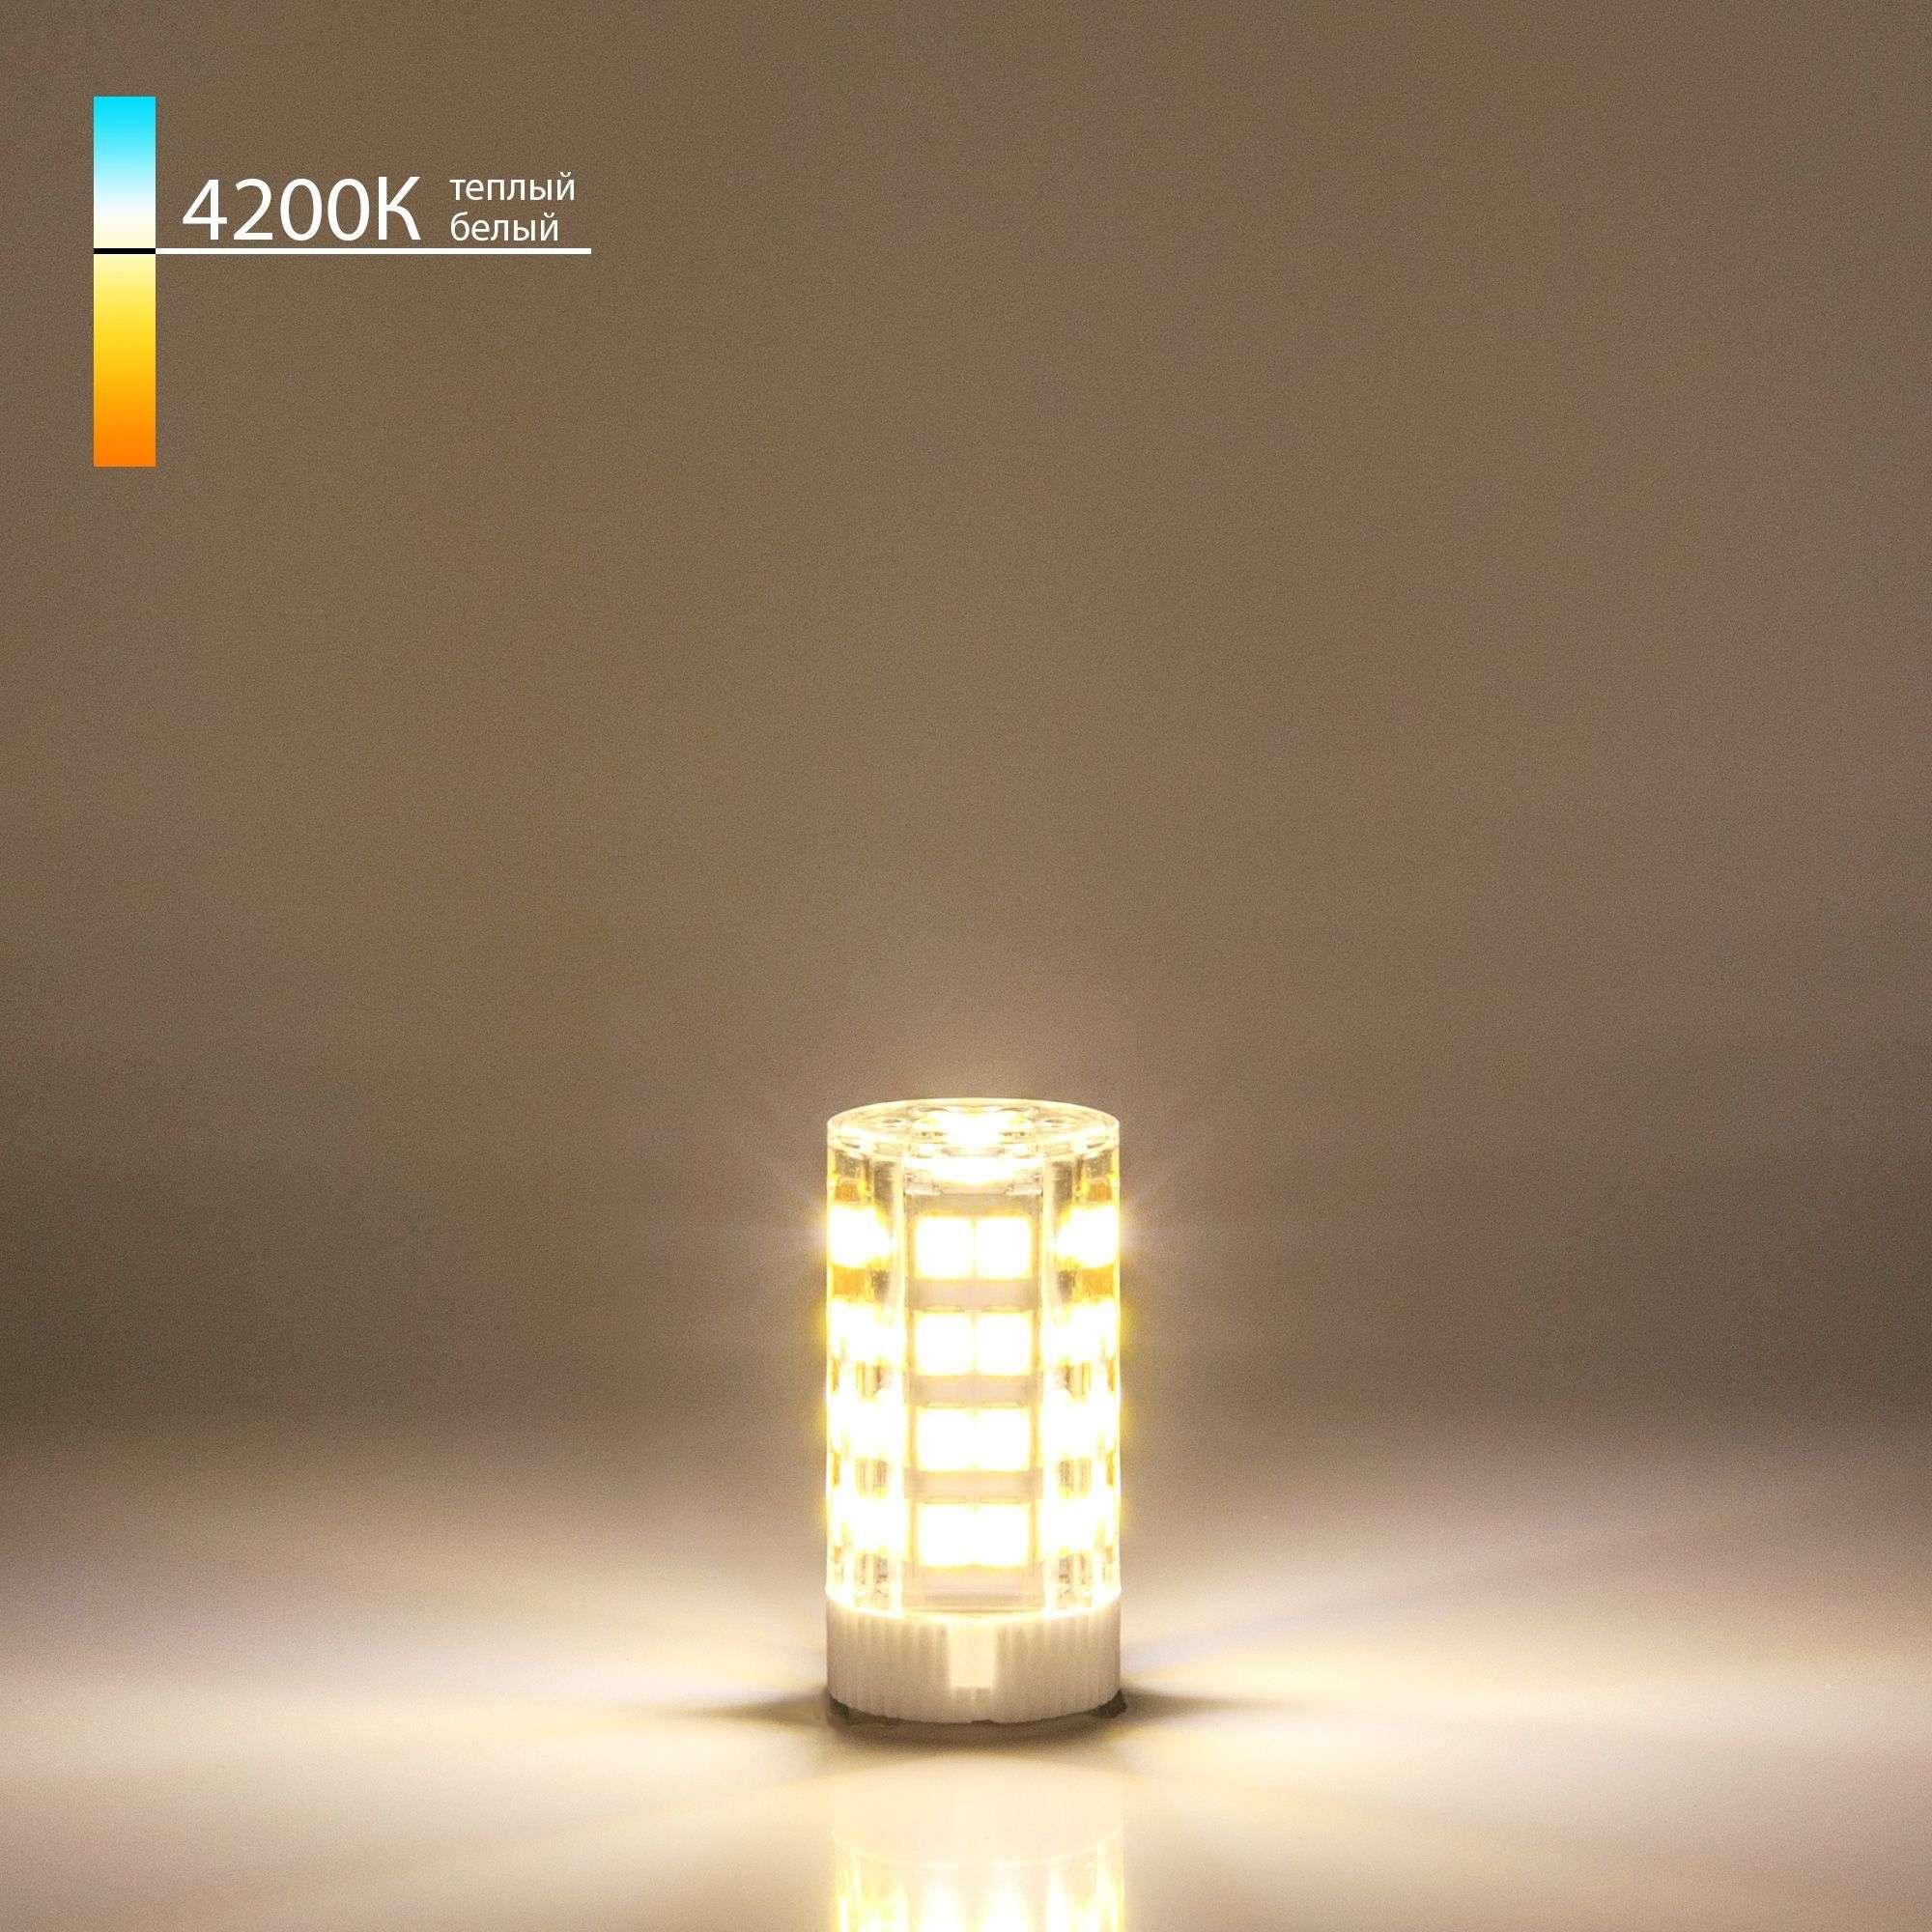 Cветодиодная лампа 7W 4200K G9 G9 LED 7W 220V 4200K